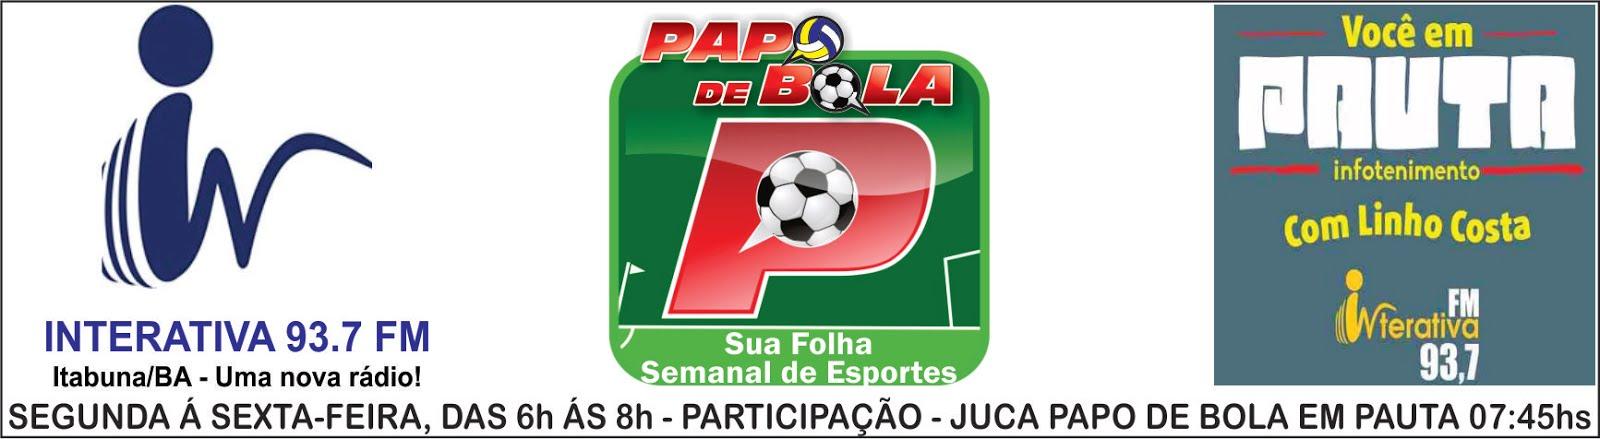 CLICK E OUÇA PAPO DE BOLA NA 93,7